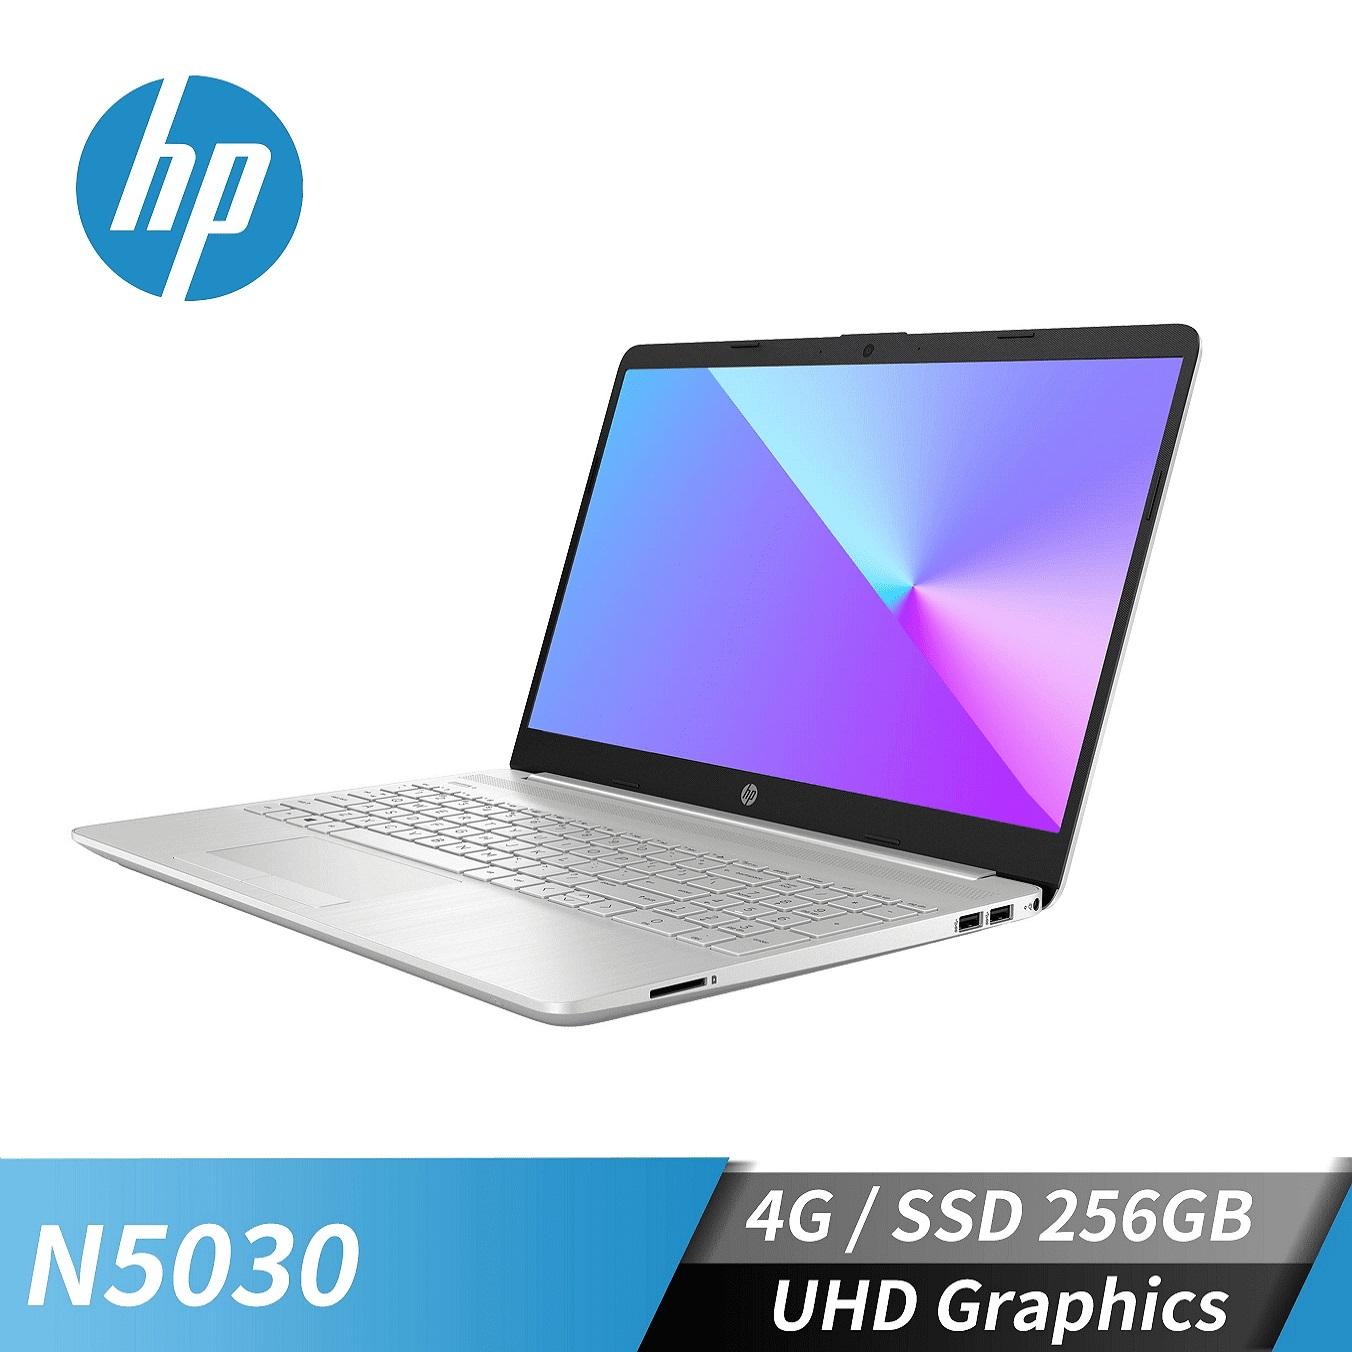 惠普 HP 超品15s 筆記型電腦(N5030/UHD Graphics/4GB/256GB)